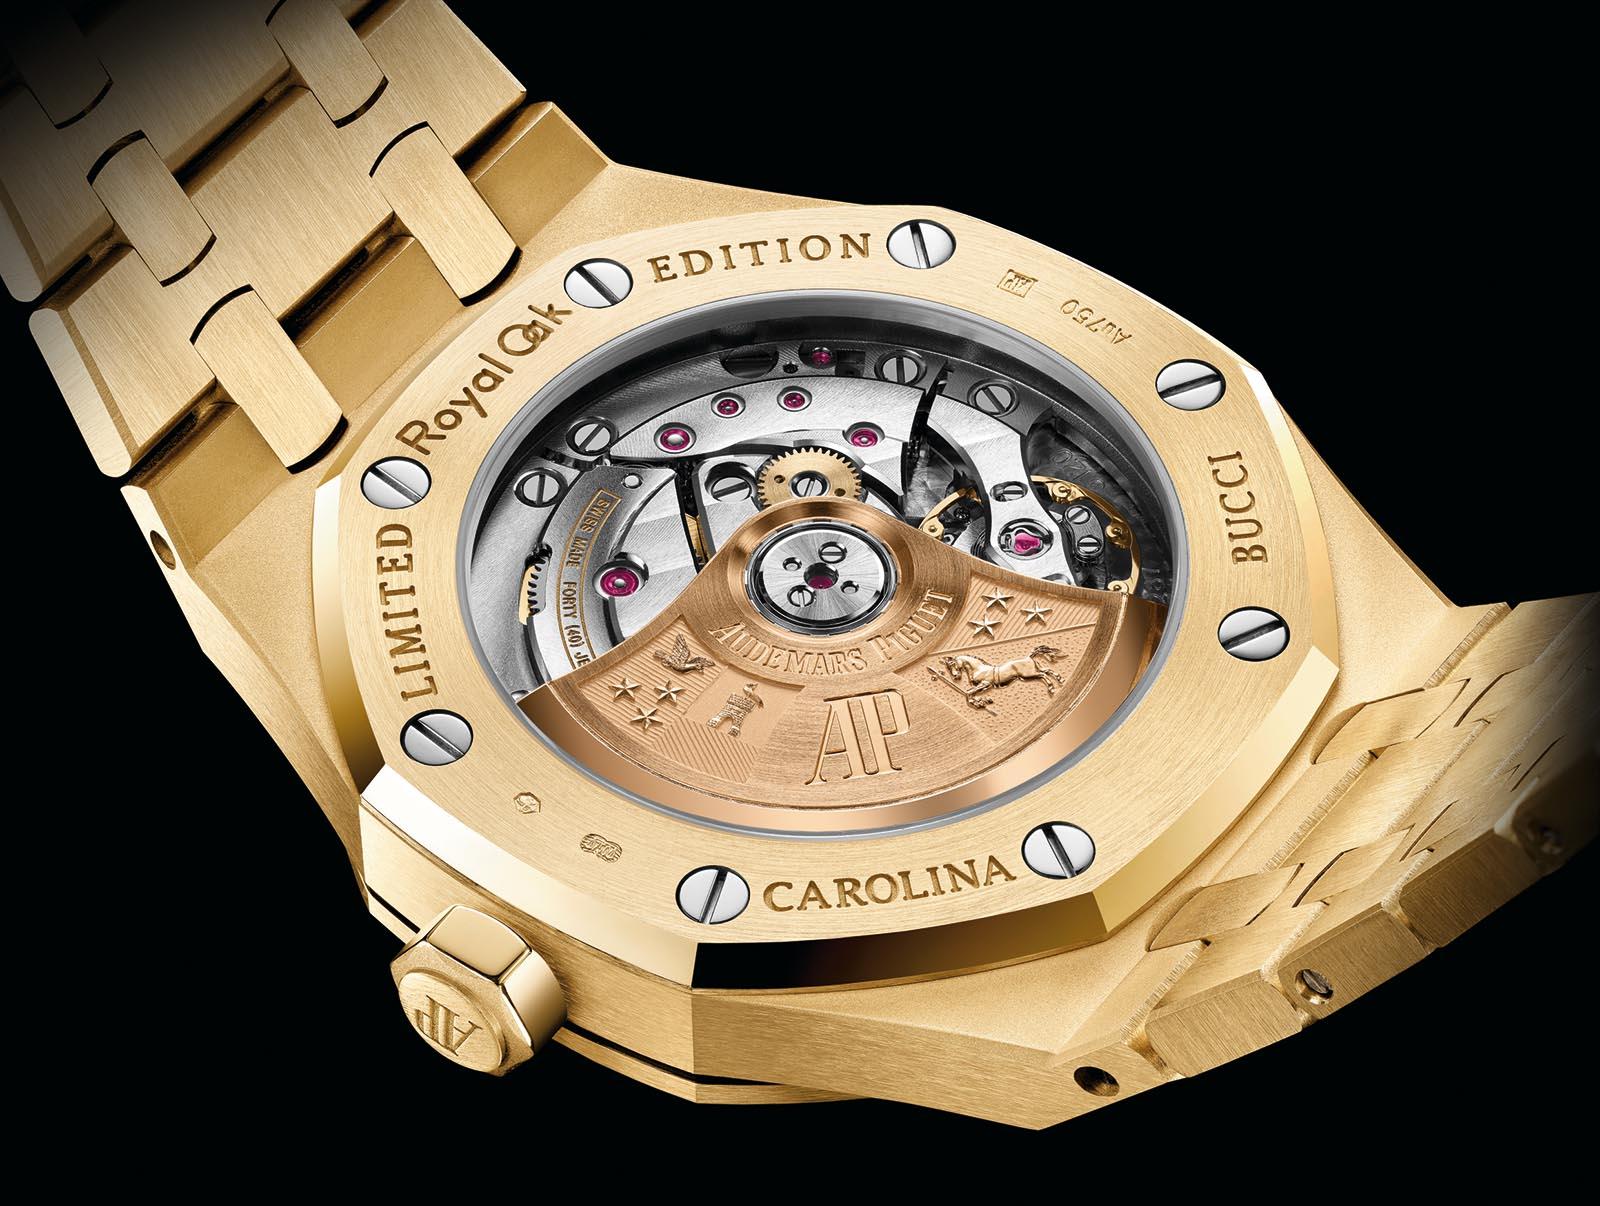 Introducing The Audemars Piguet Royal Oak Carolina Bucci Sjx Watches